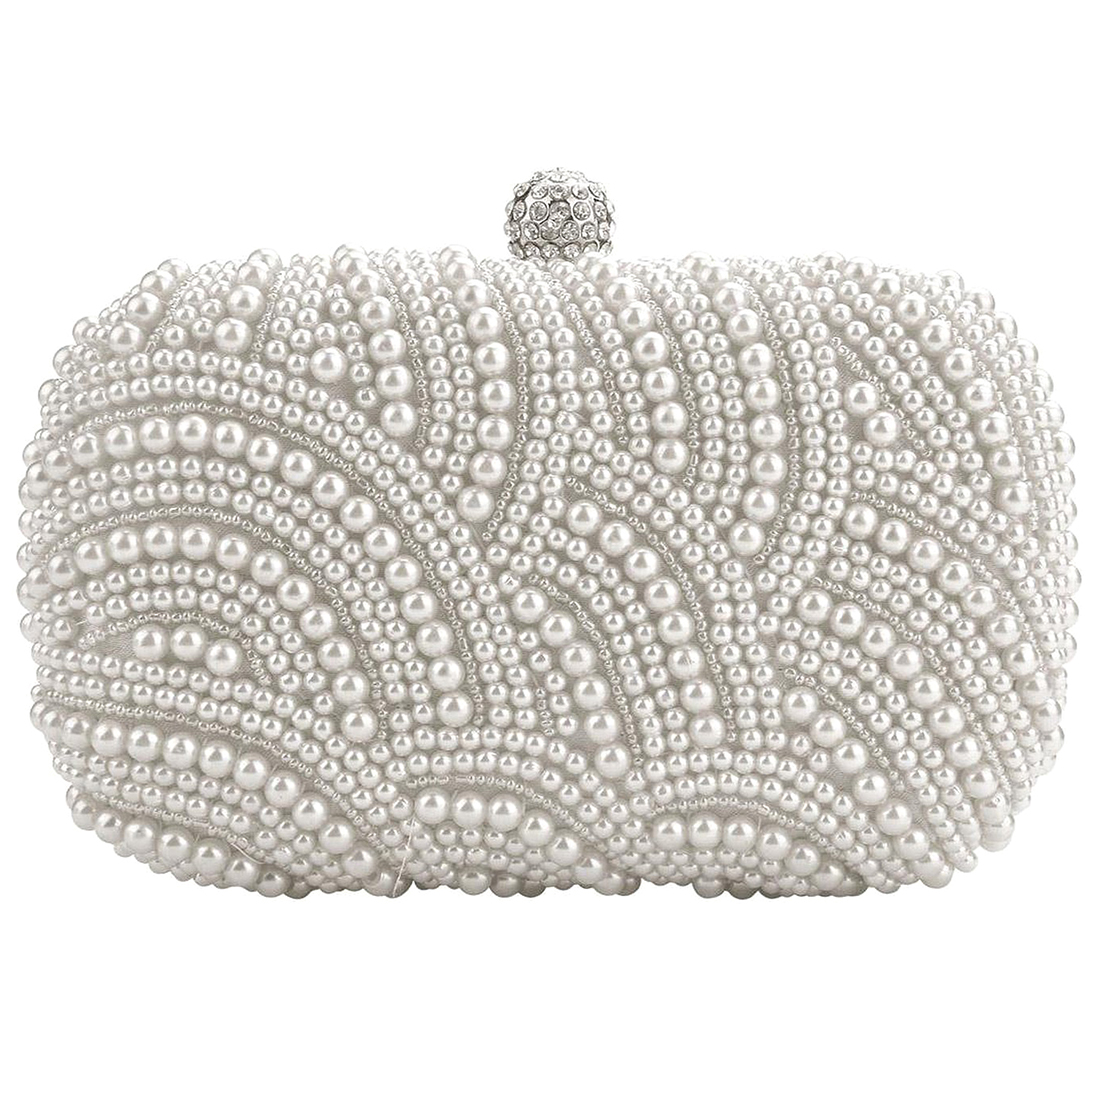 Wholesale10pcs*Fashion Clutch Bag Beaded Party Bridal Handbag Wedding Evening Purse